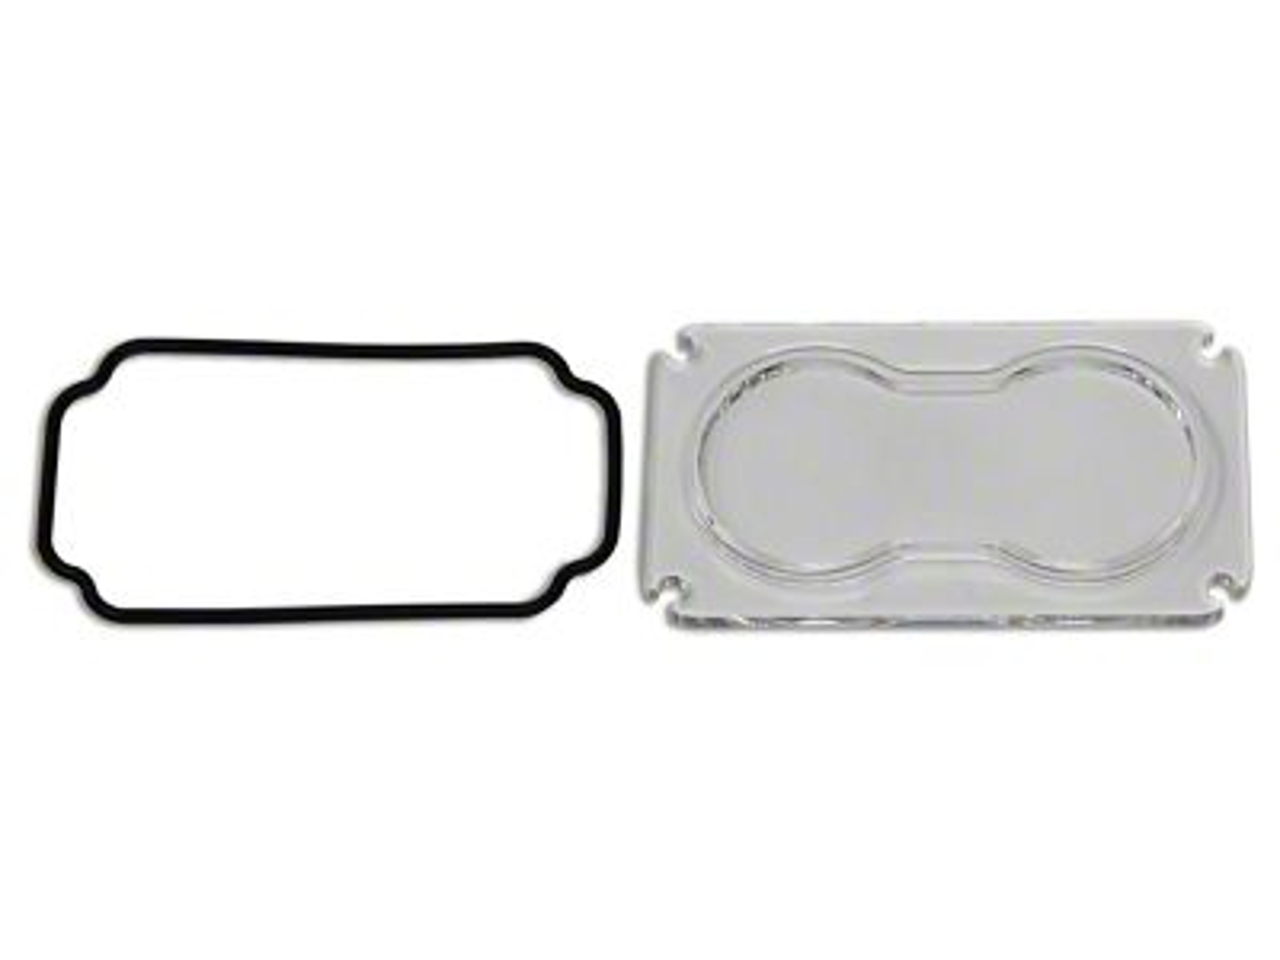 Baja Designs S2 Series Lens Kit - Spot Beam (87-19 Jeep Wrangler YJ, TJ, JK & JL)